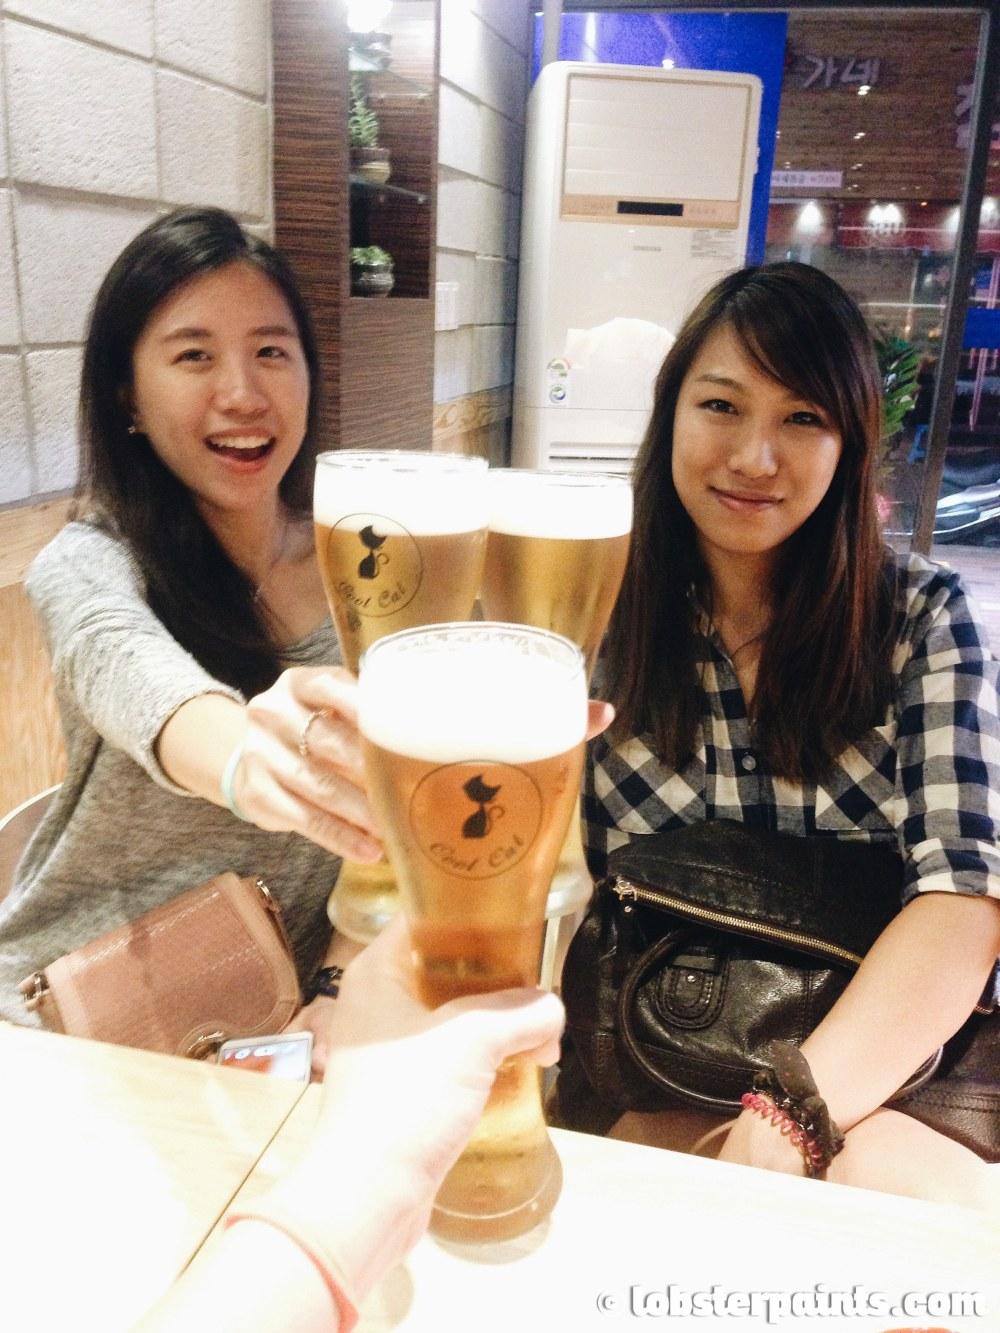 27 Sep 2014: Chicken & Beer at Cool Cat   Busan, South Korea